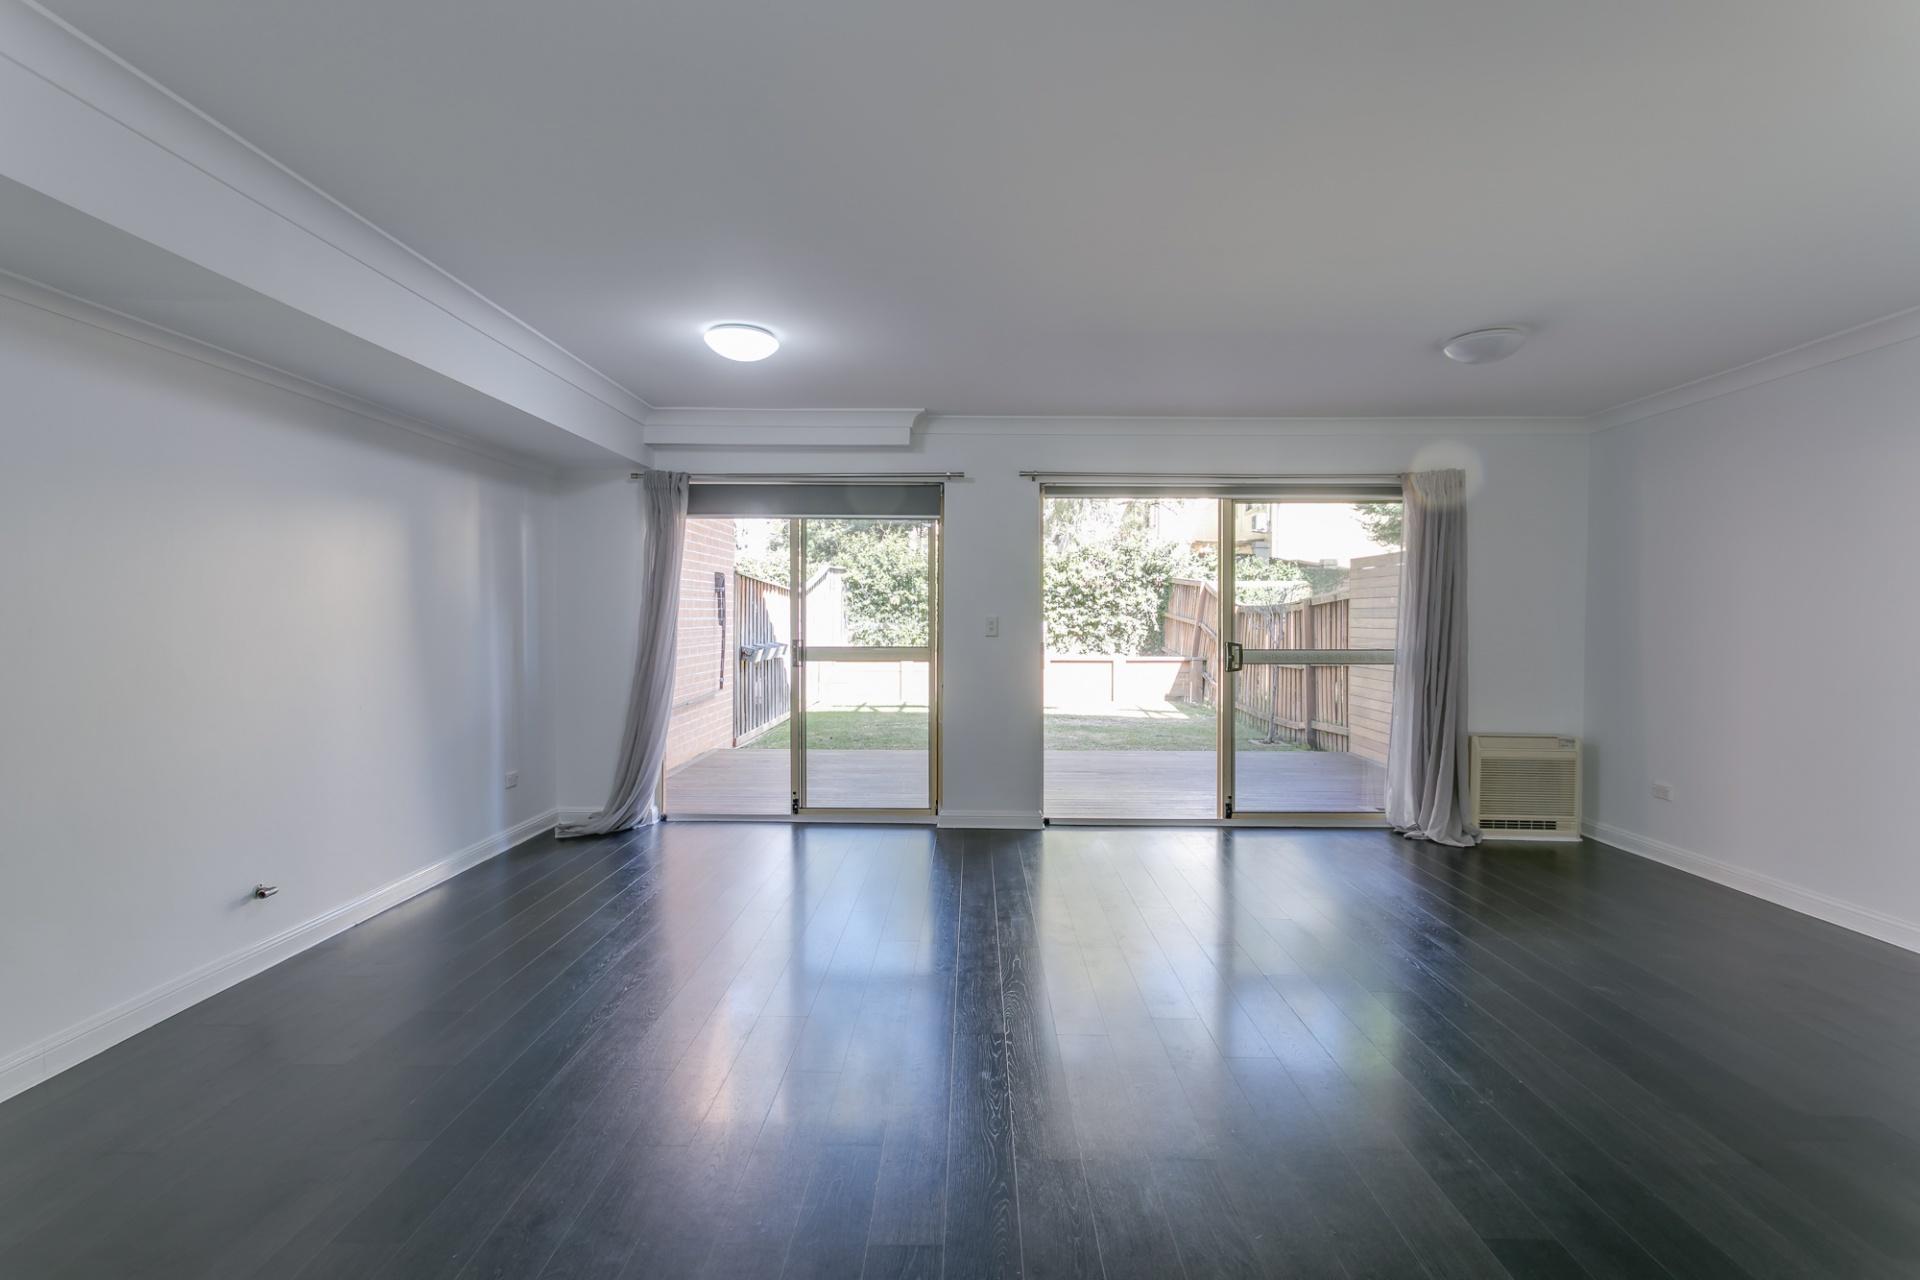 3 Rooms, House, Leased, Castle Street, 2 Bathrooms, Listing ID 1320, Castle Hill, NSW, Australia,